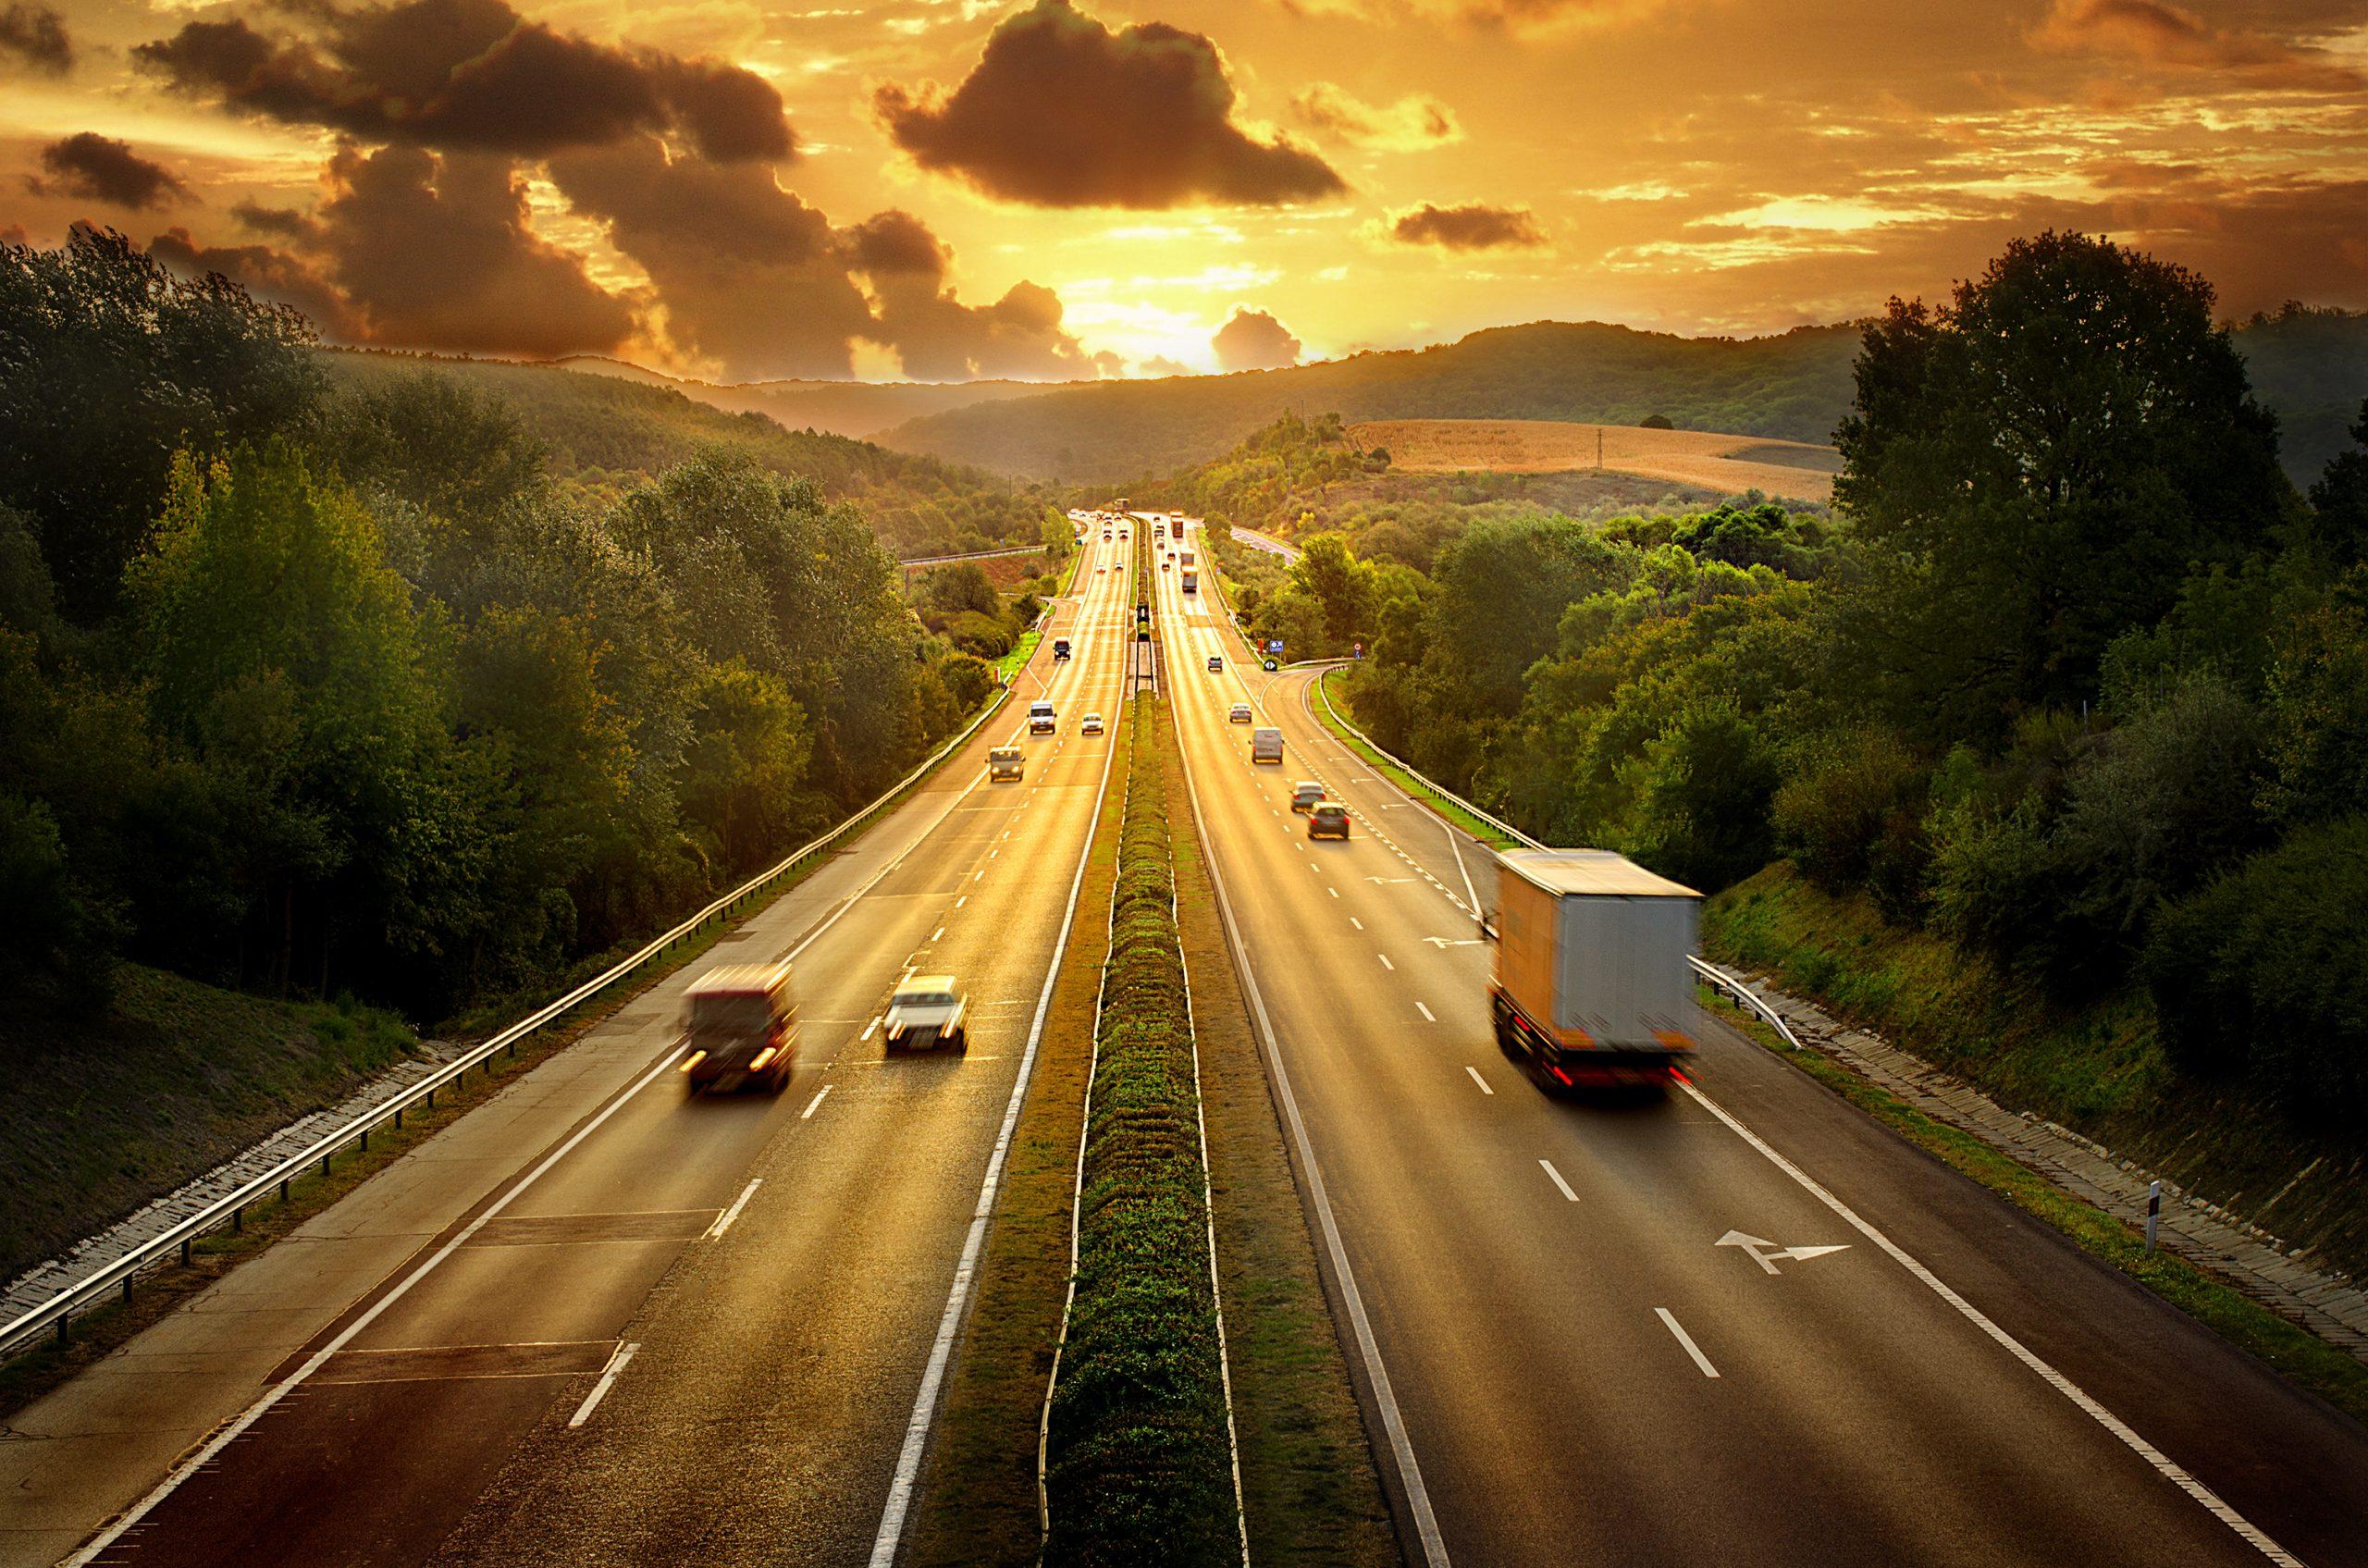 Risky Freeway: 4 Keys To Safe High-Speed Travels